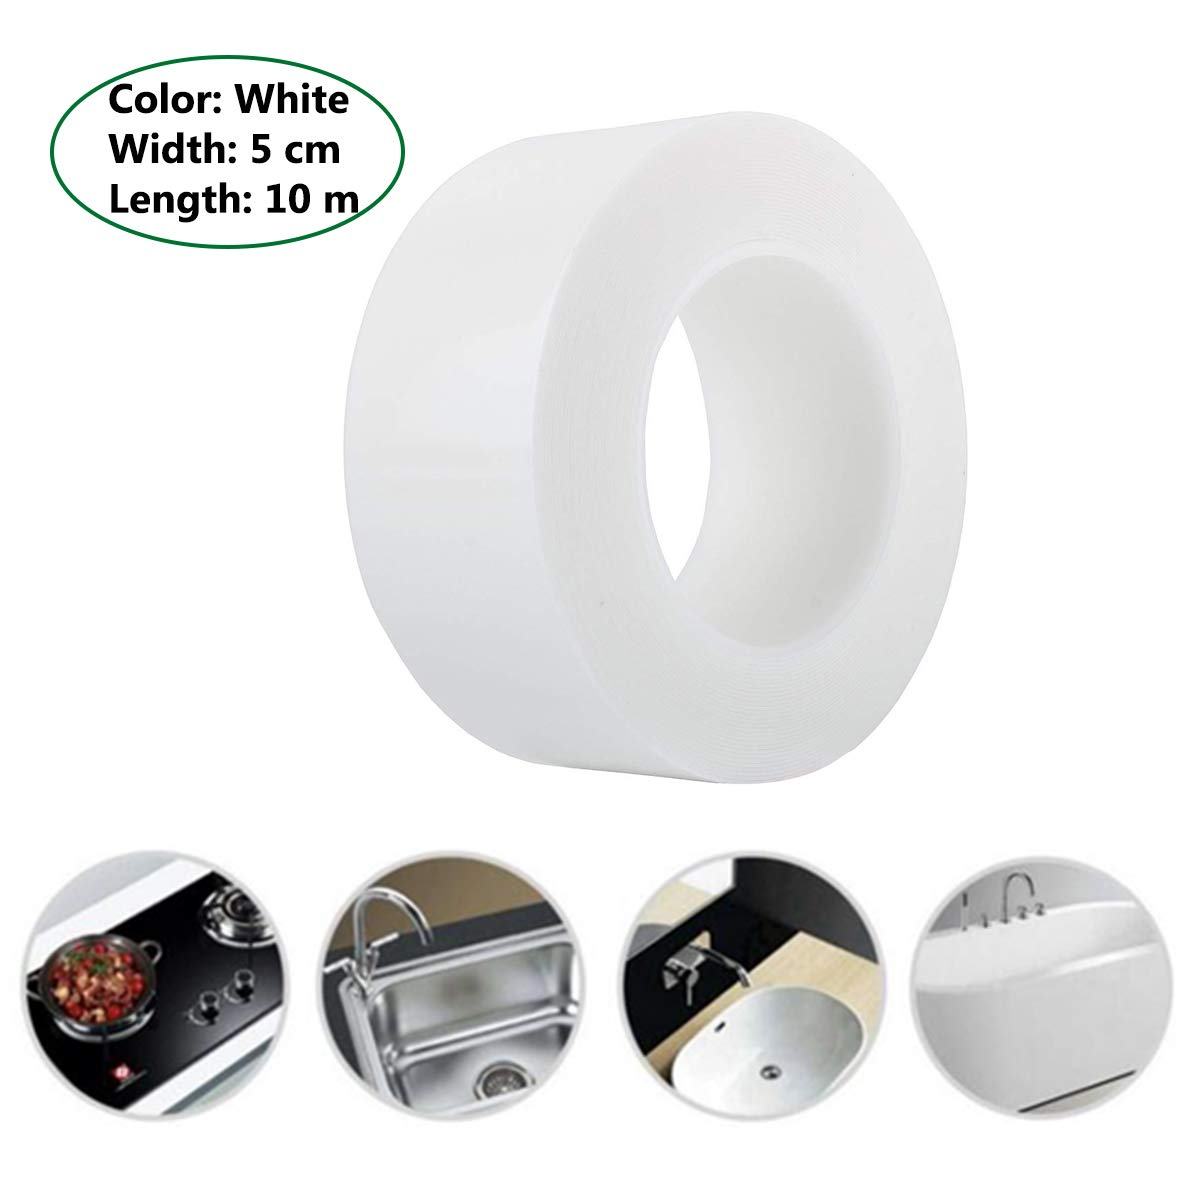 Bathtub Caulk Strip Self Adhesive Tape for Bathtub Bathroom Shower Toilet Kitchen Waterproof Wall Sealing 5 cm x 10 m, White